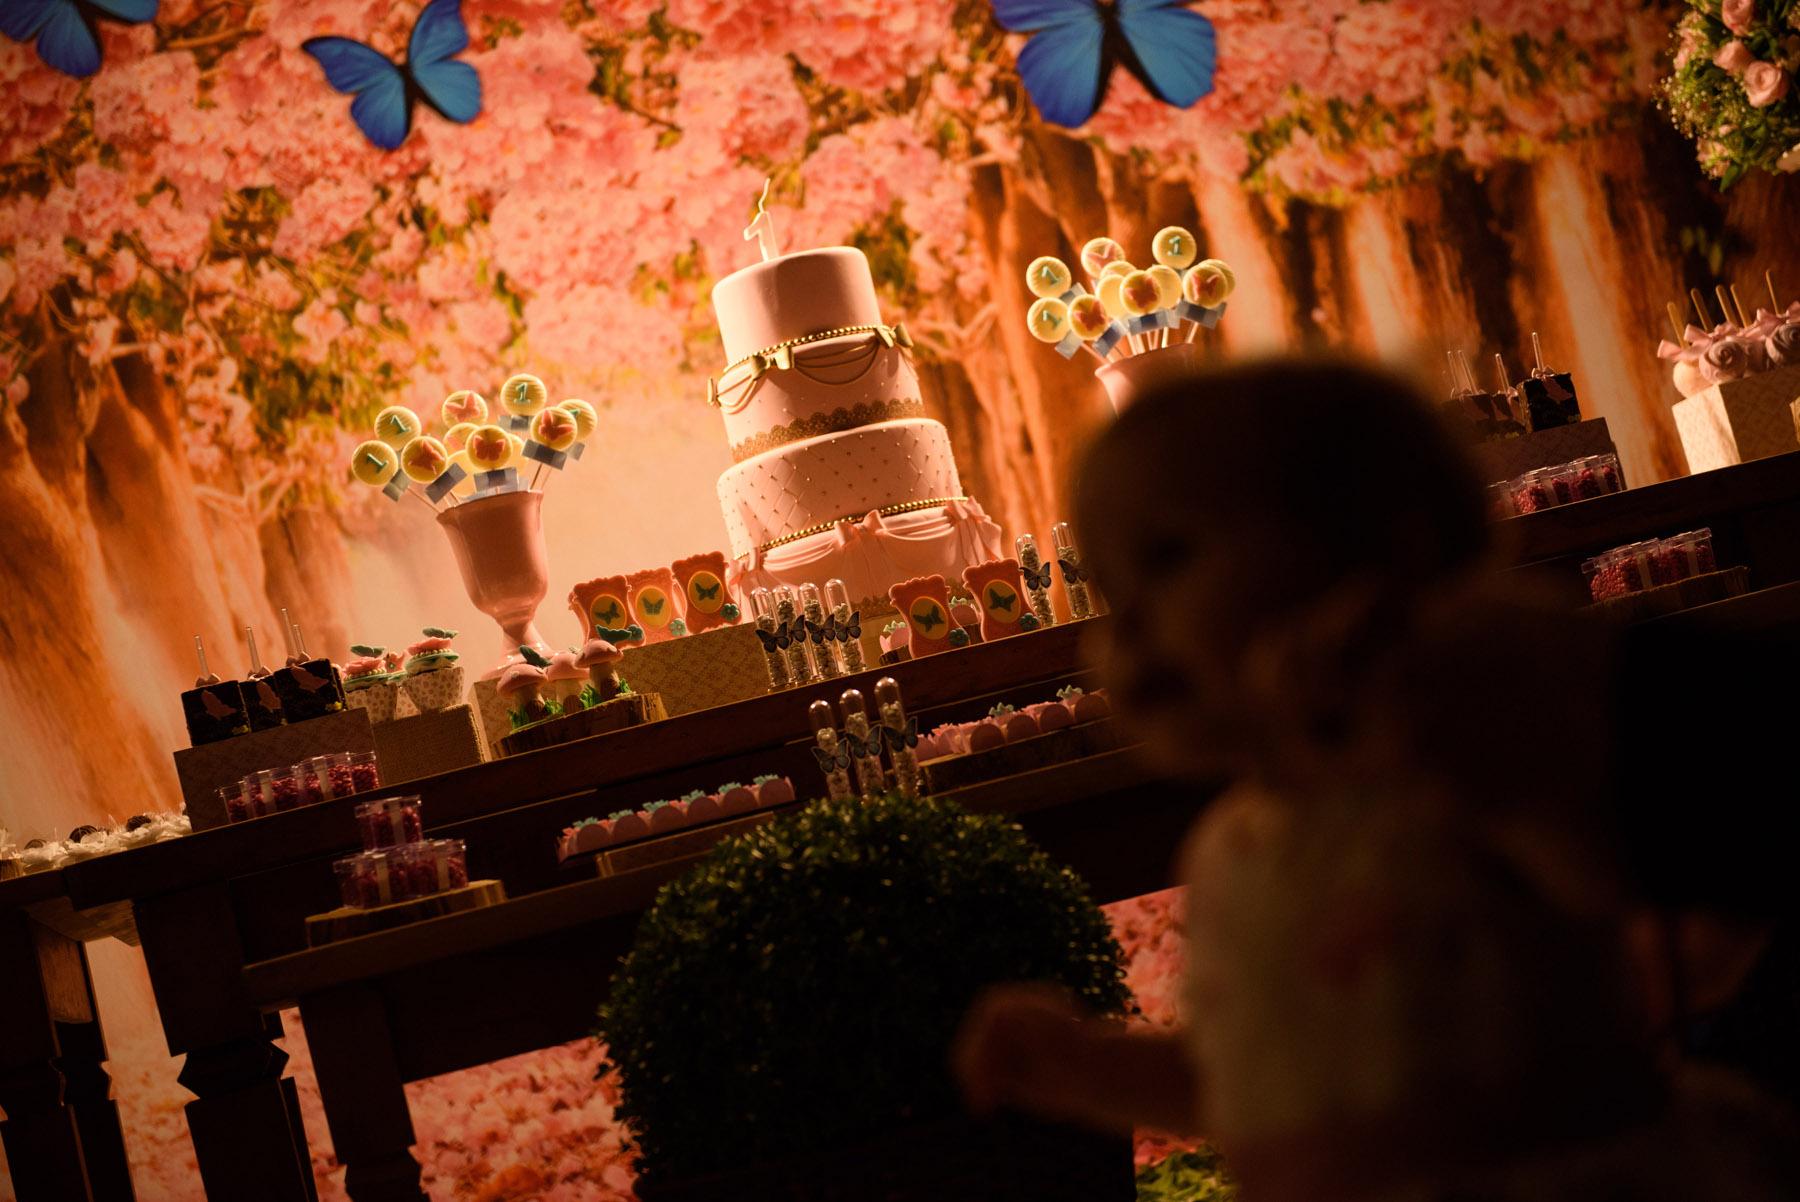 12-aniversario-infantil-1ano-mundo-kids-festa-infantil-curitiba-guswanderley.jpg